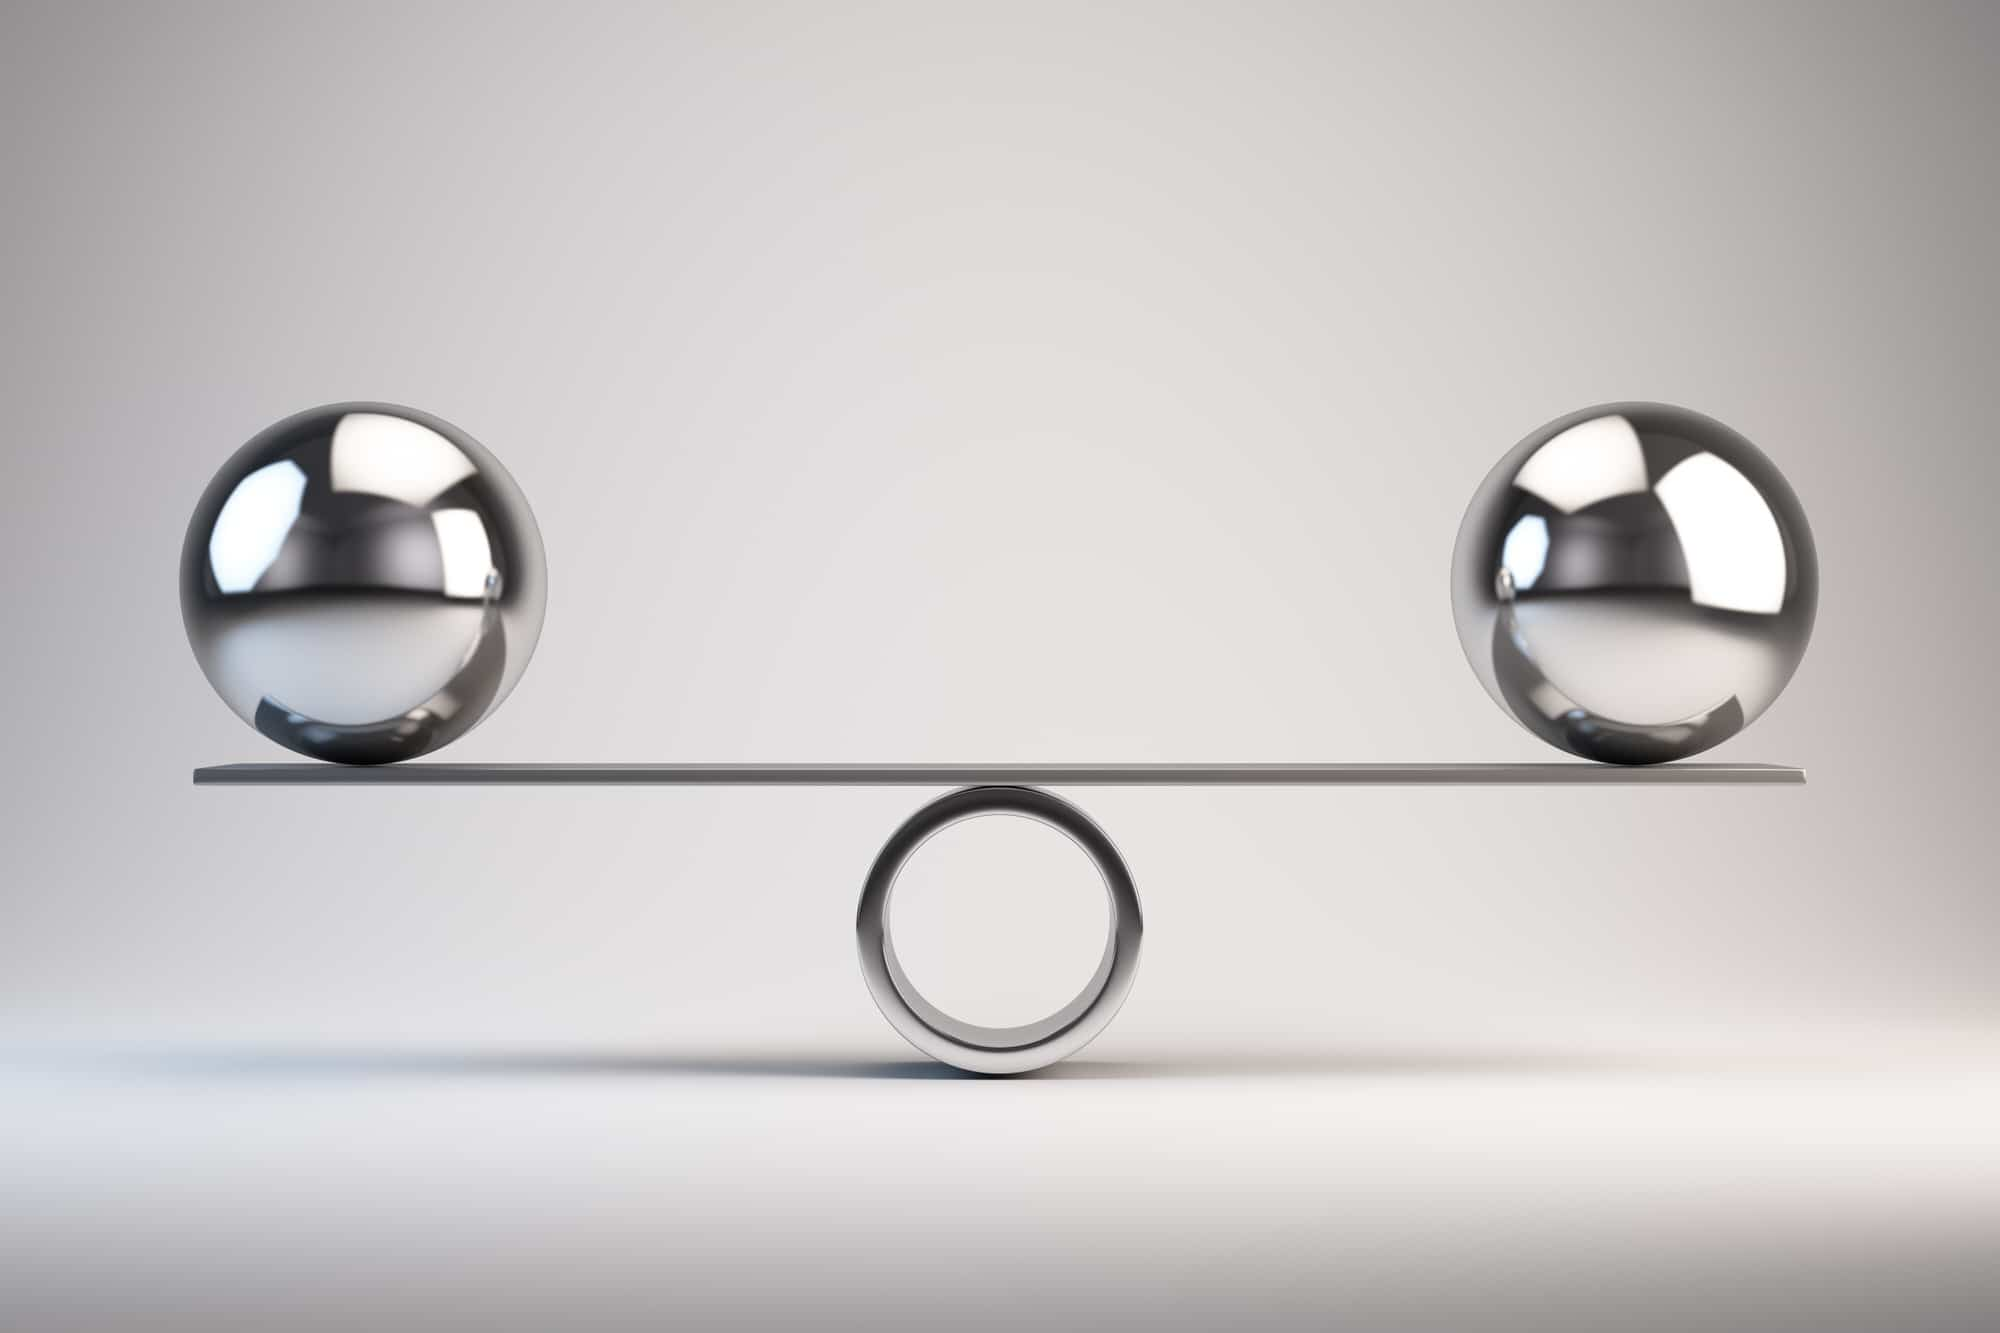 Photo of two metal spheres balancing on a sheet of metal